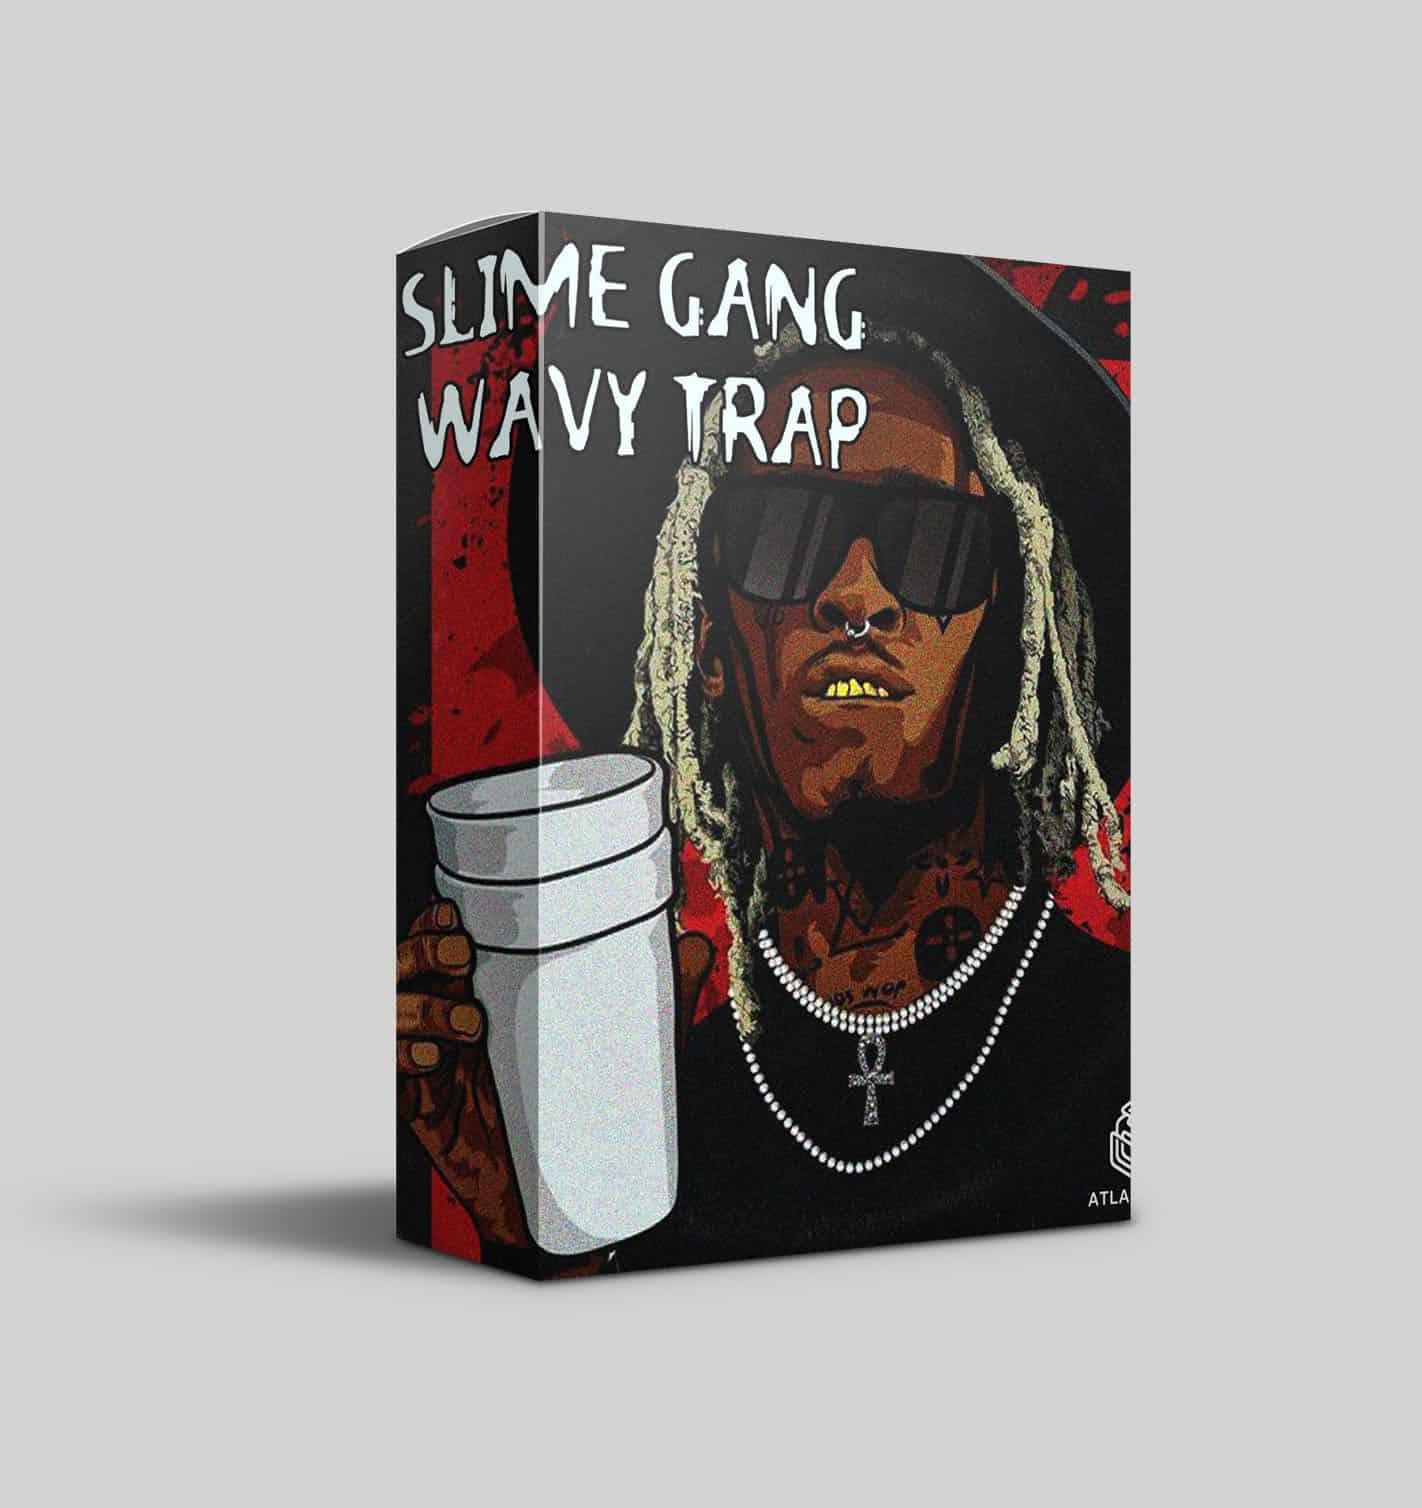 Slime Gang Wavy Trap